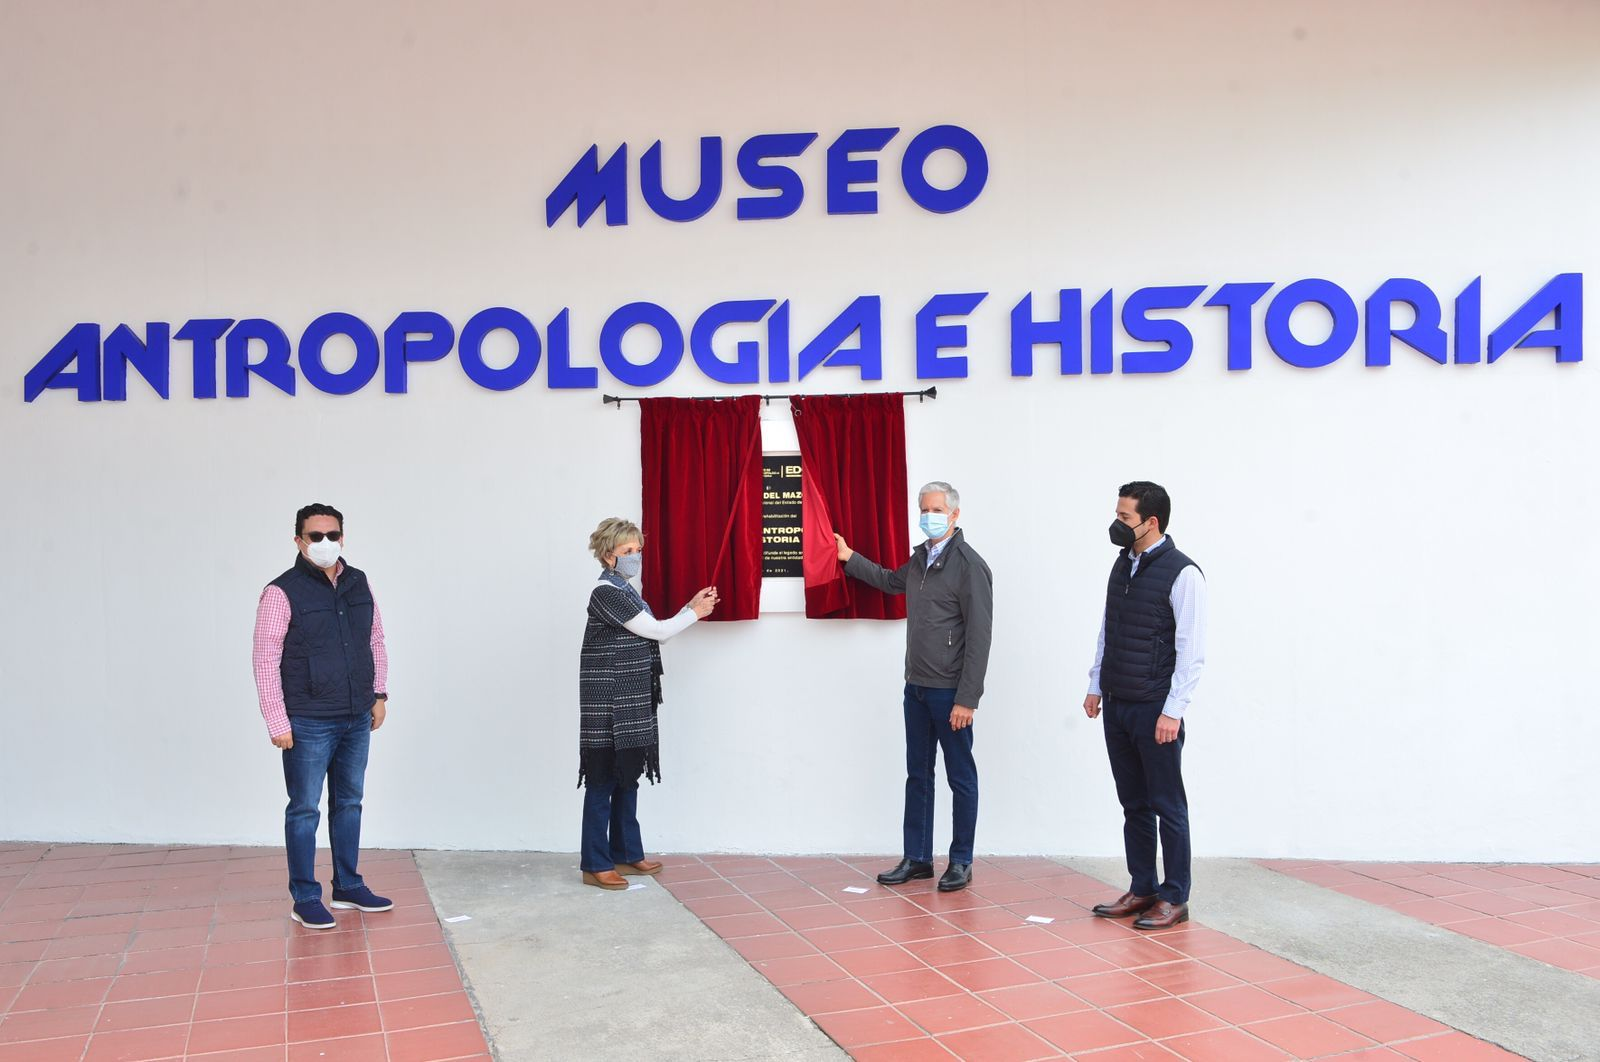 ENTREGA ALFREDO DEL MAZO REHABILITACIÓN DEL MUSEO DE ANTROPOLOGÍA E HISTORIA